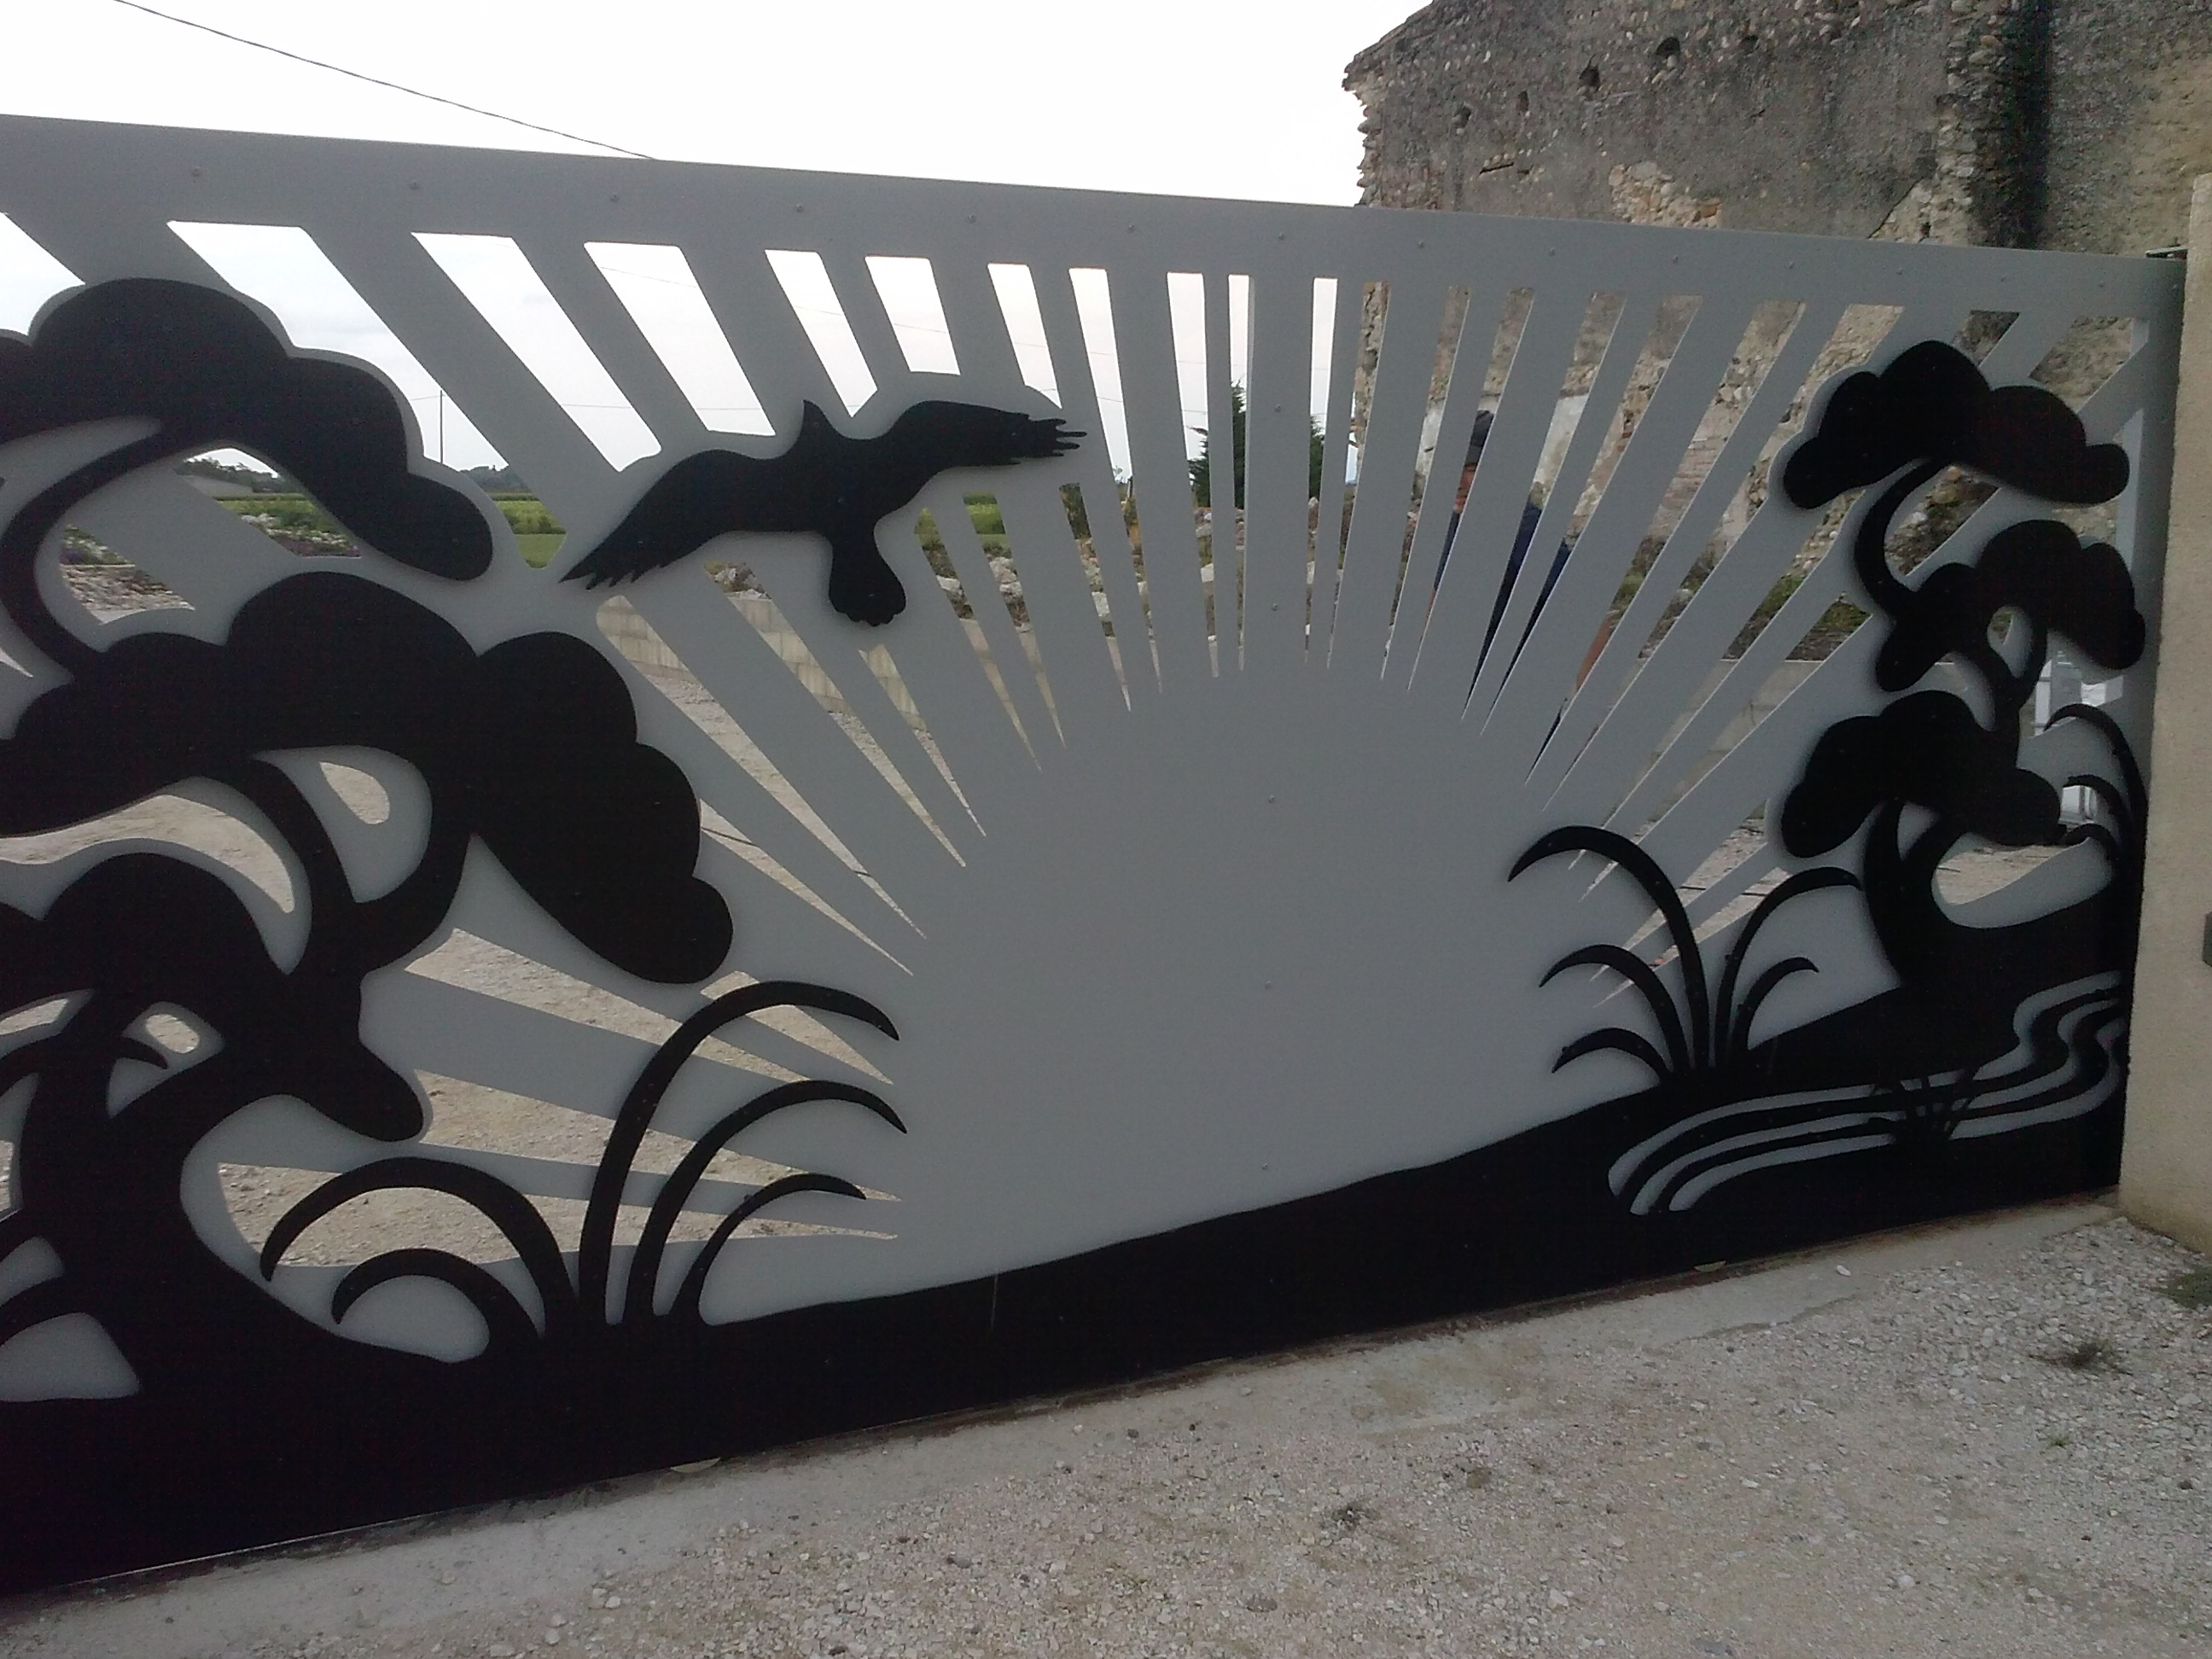 d coration ext rieure metal art design by jessica salmeron. Black Bedroom Furniture Sets. Home Design Ideas